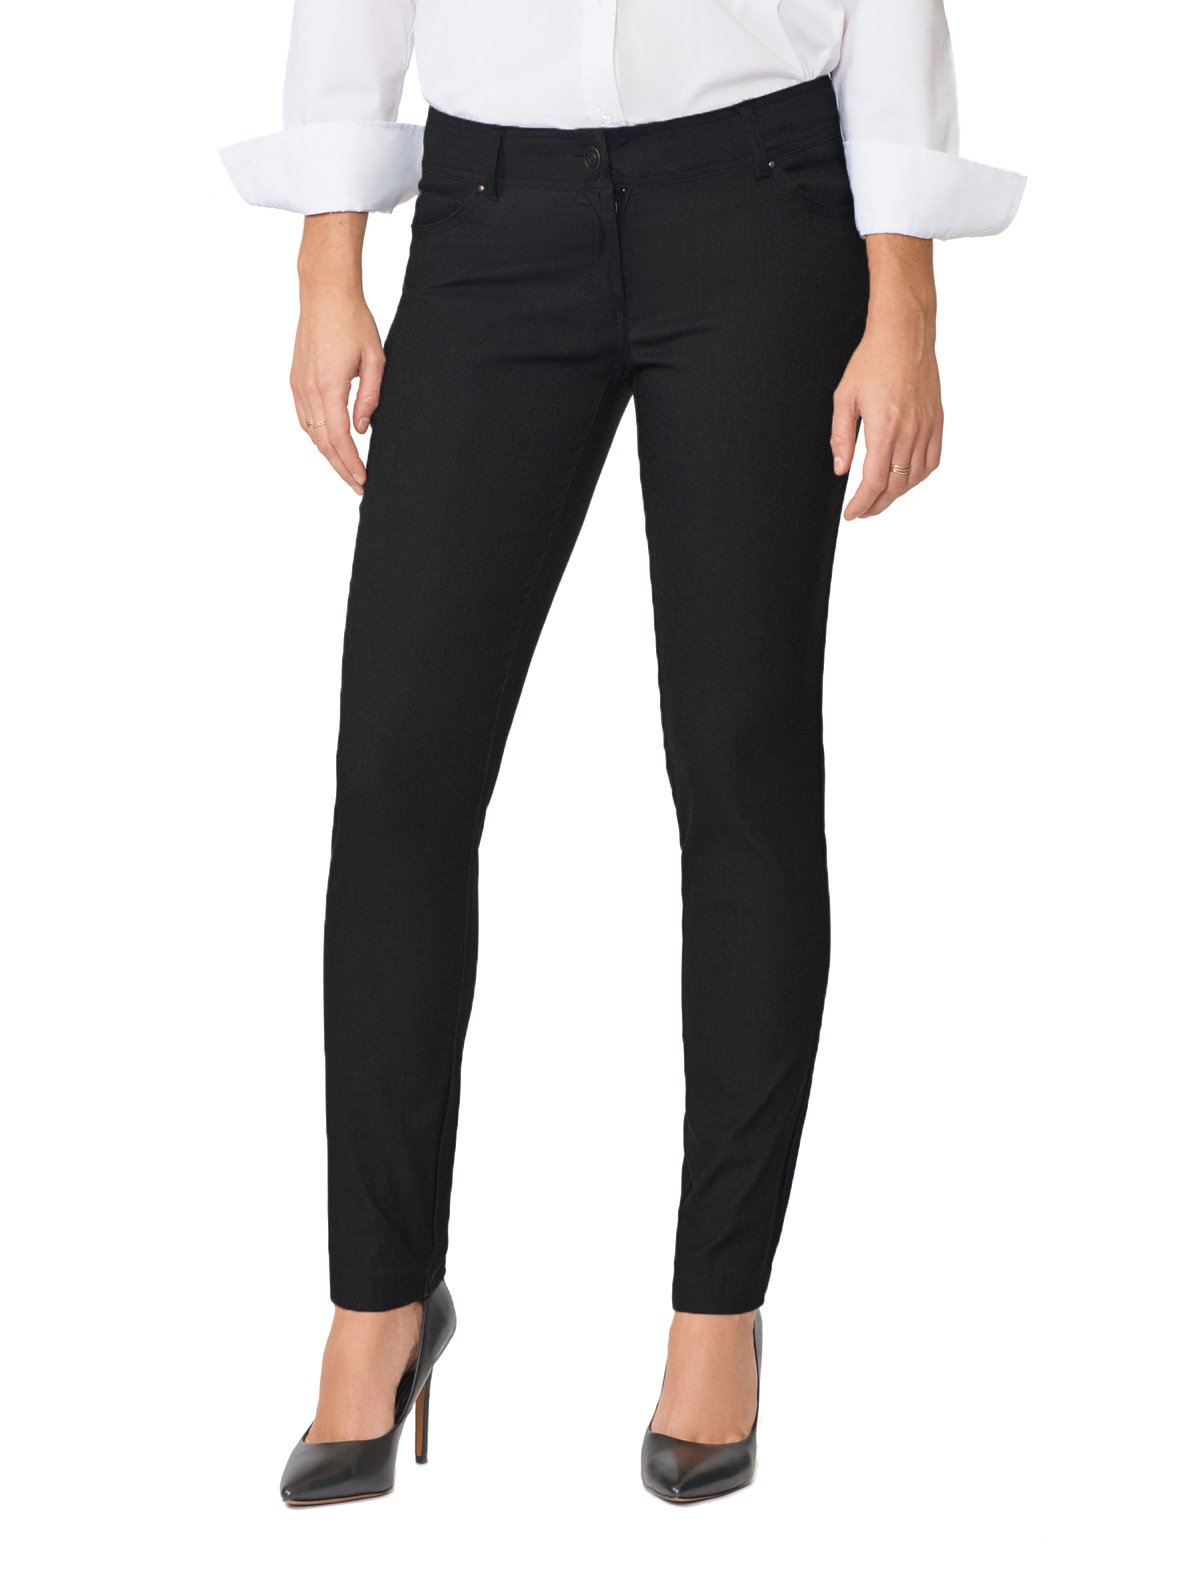 89th&Madison Five Pocket Stretch Straight Leg Pants (10, Black)